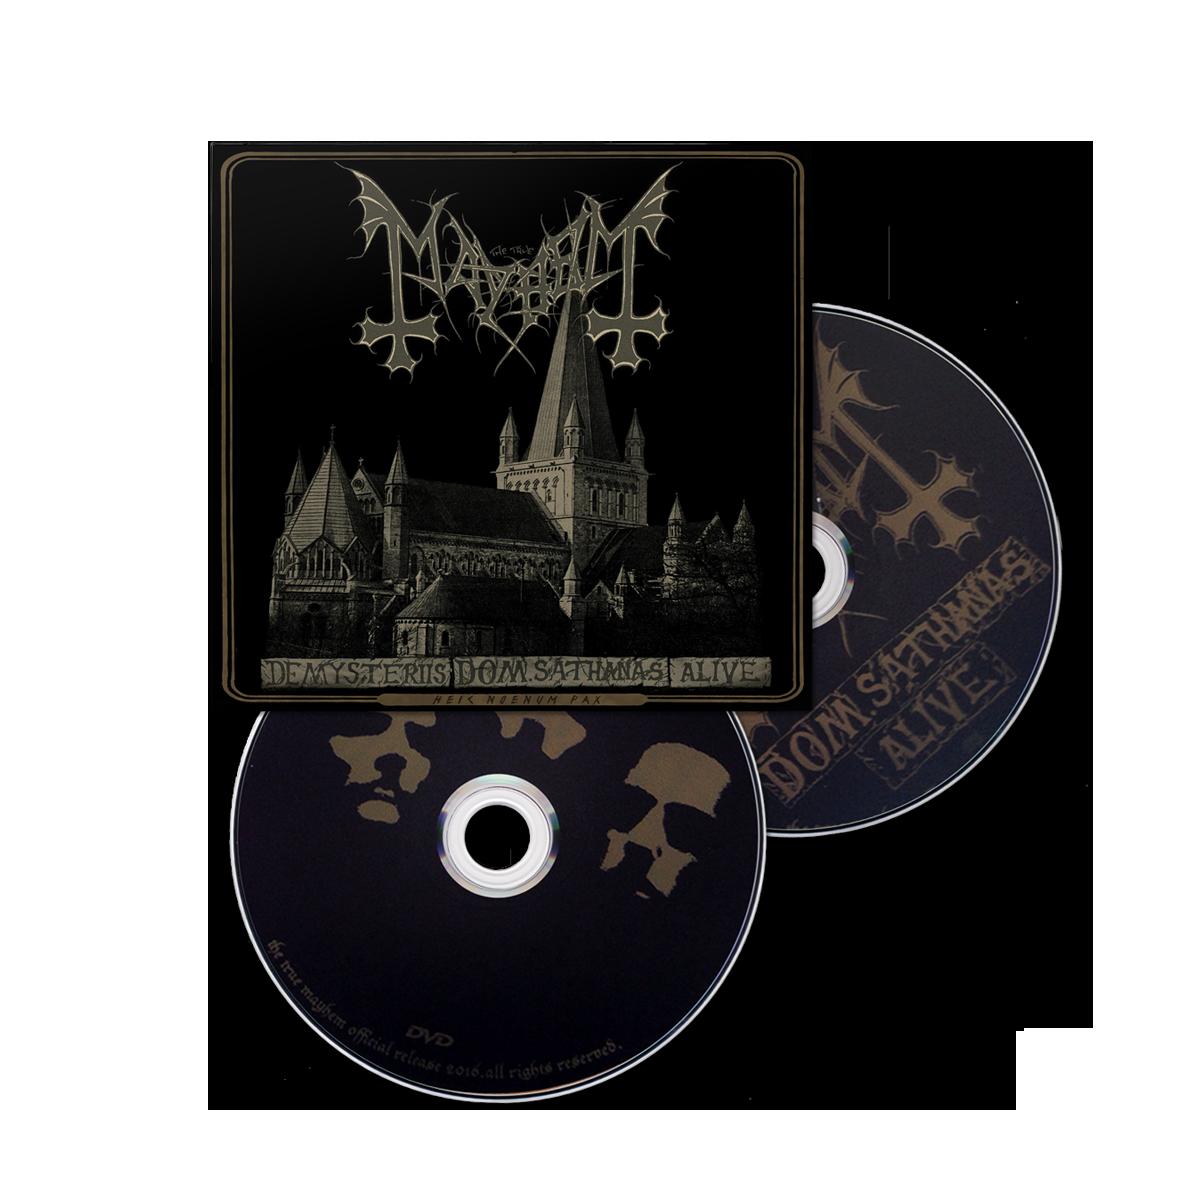 IMAGE | De Mysteriis Dom Sathanas Alive CD/DVD